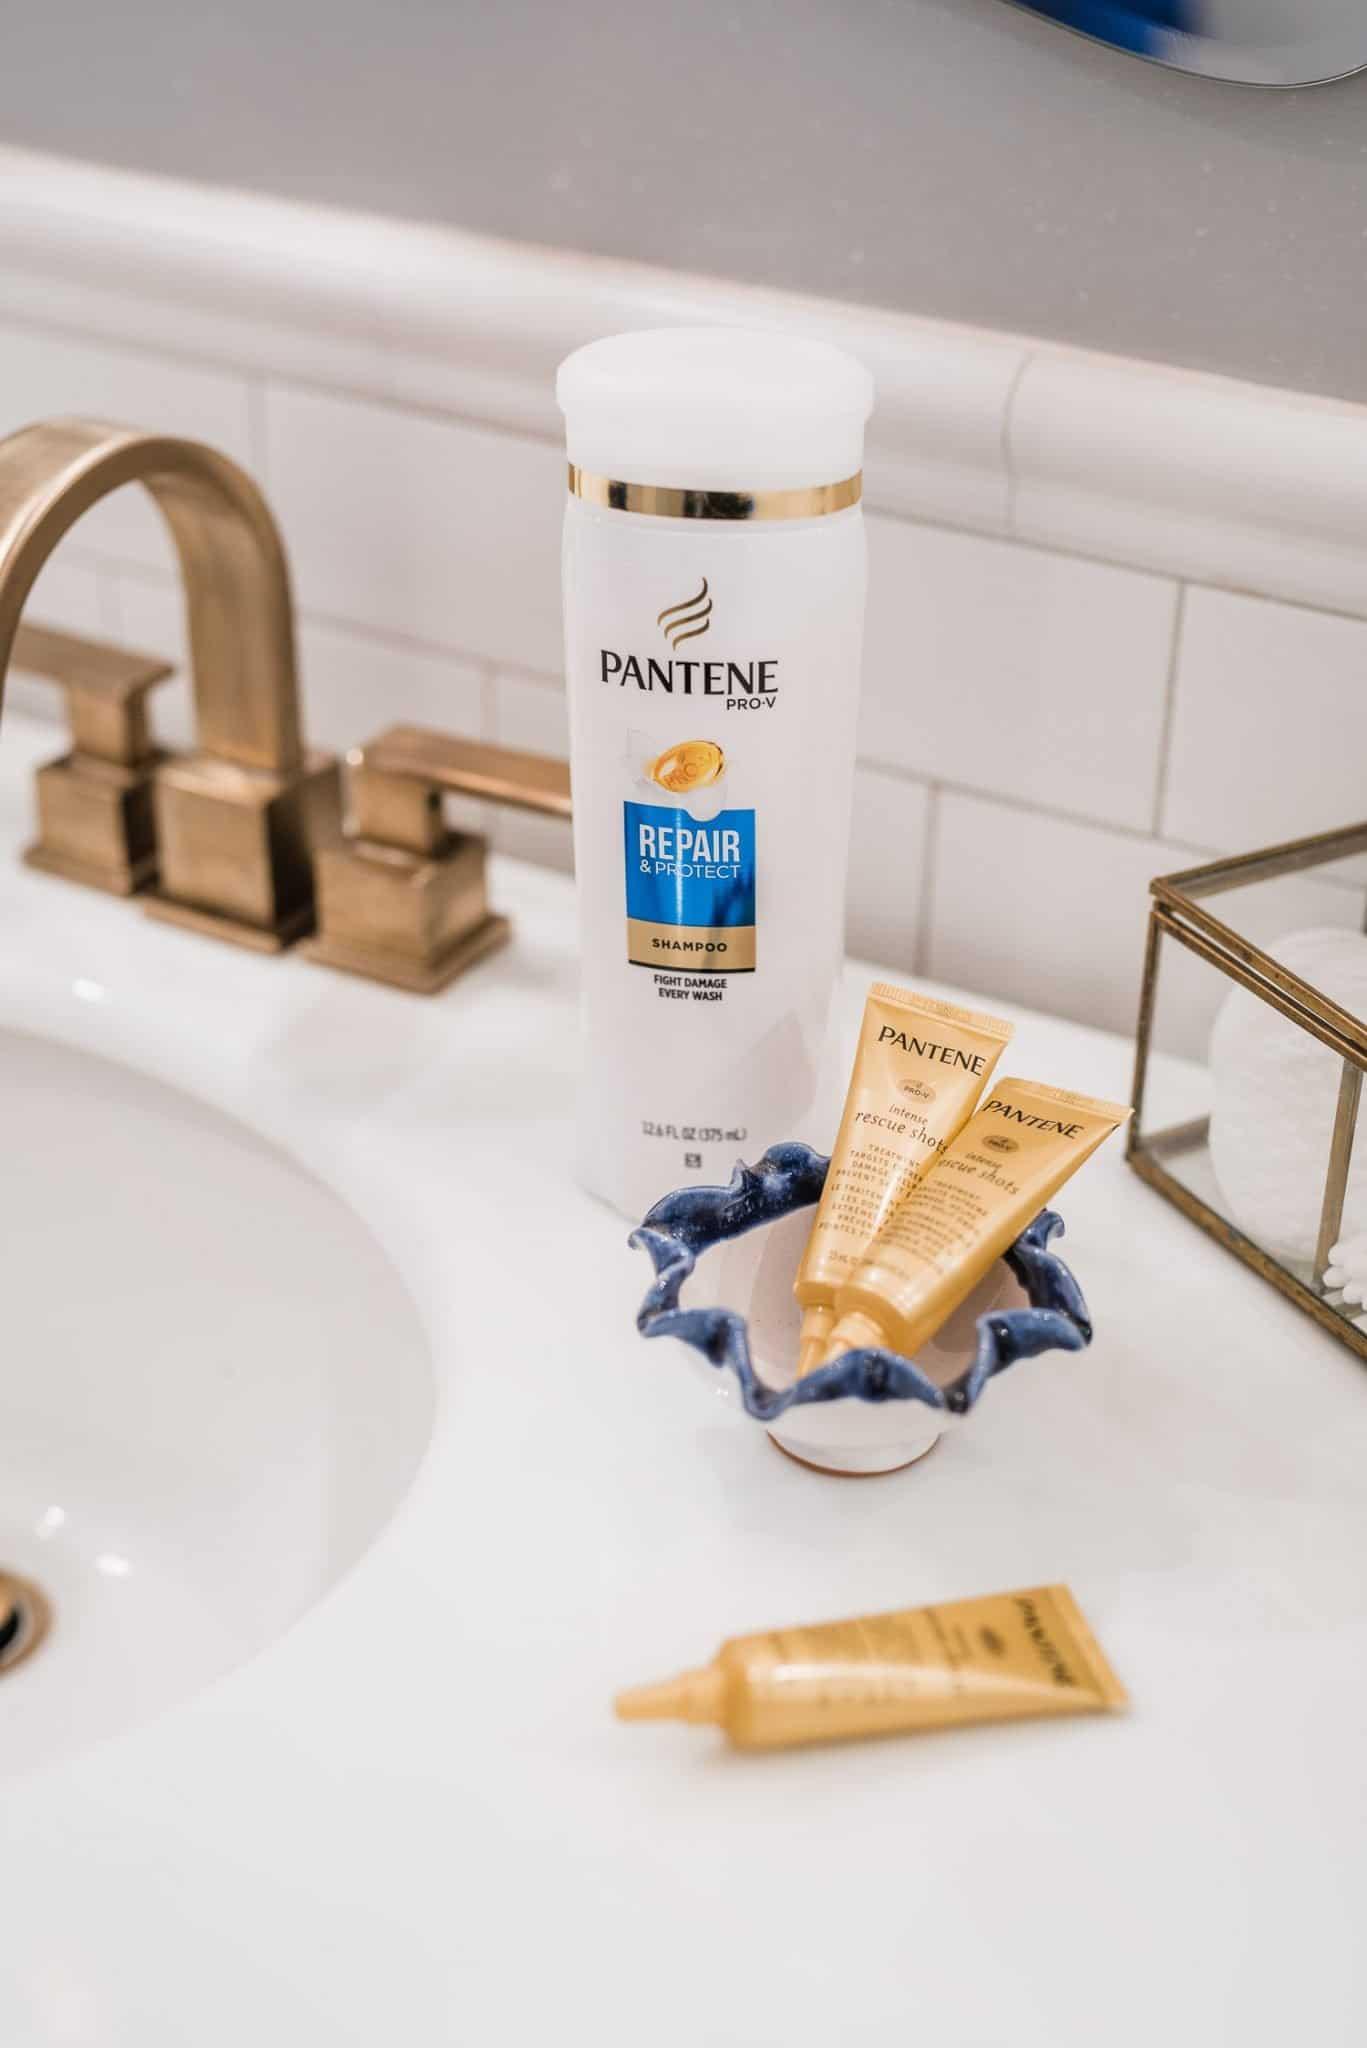 Pantene Shampoo & Pantene Pro-V Intense Rescue Shots